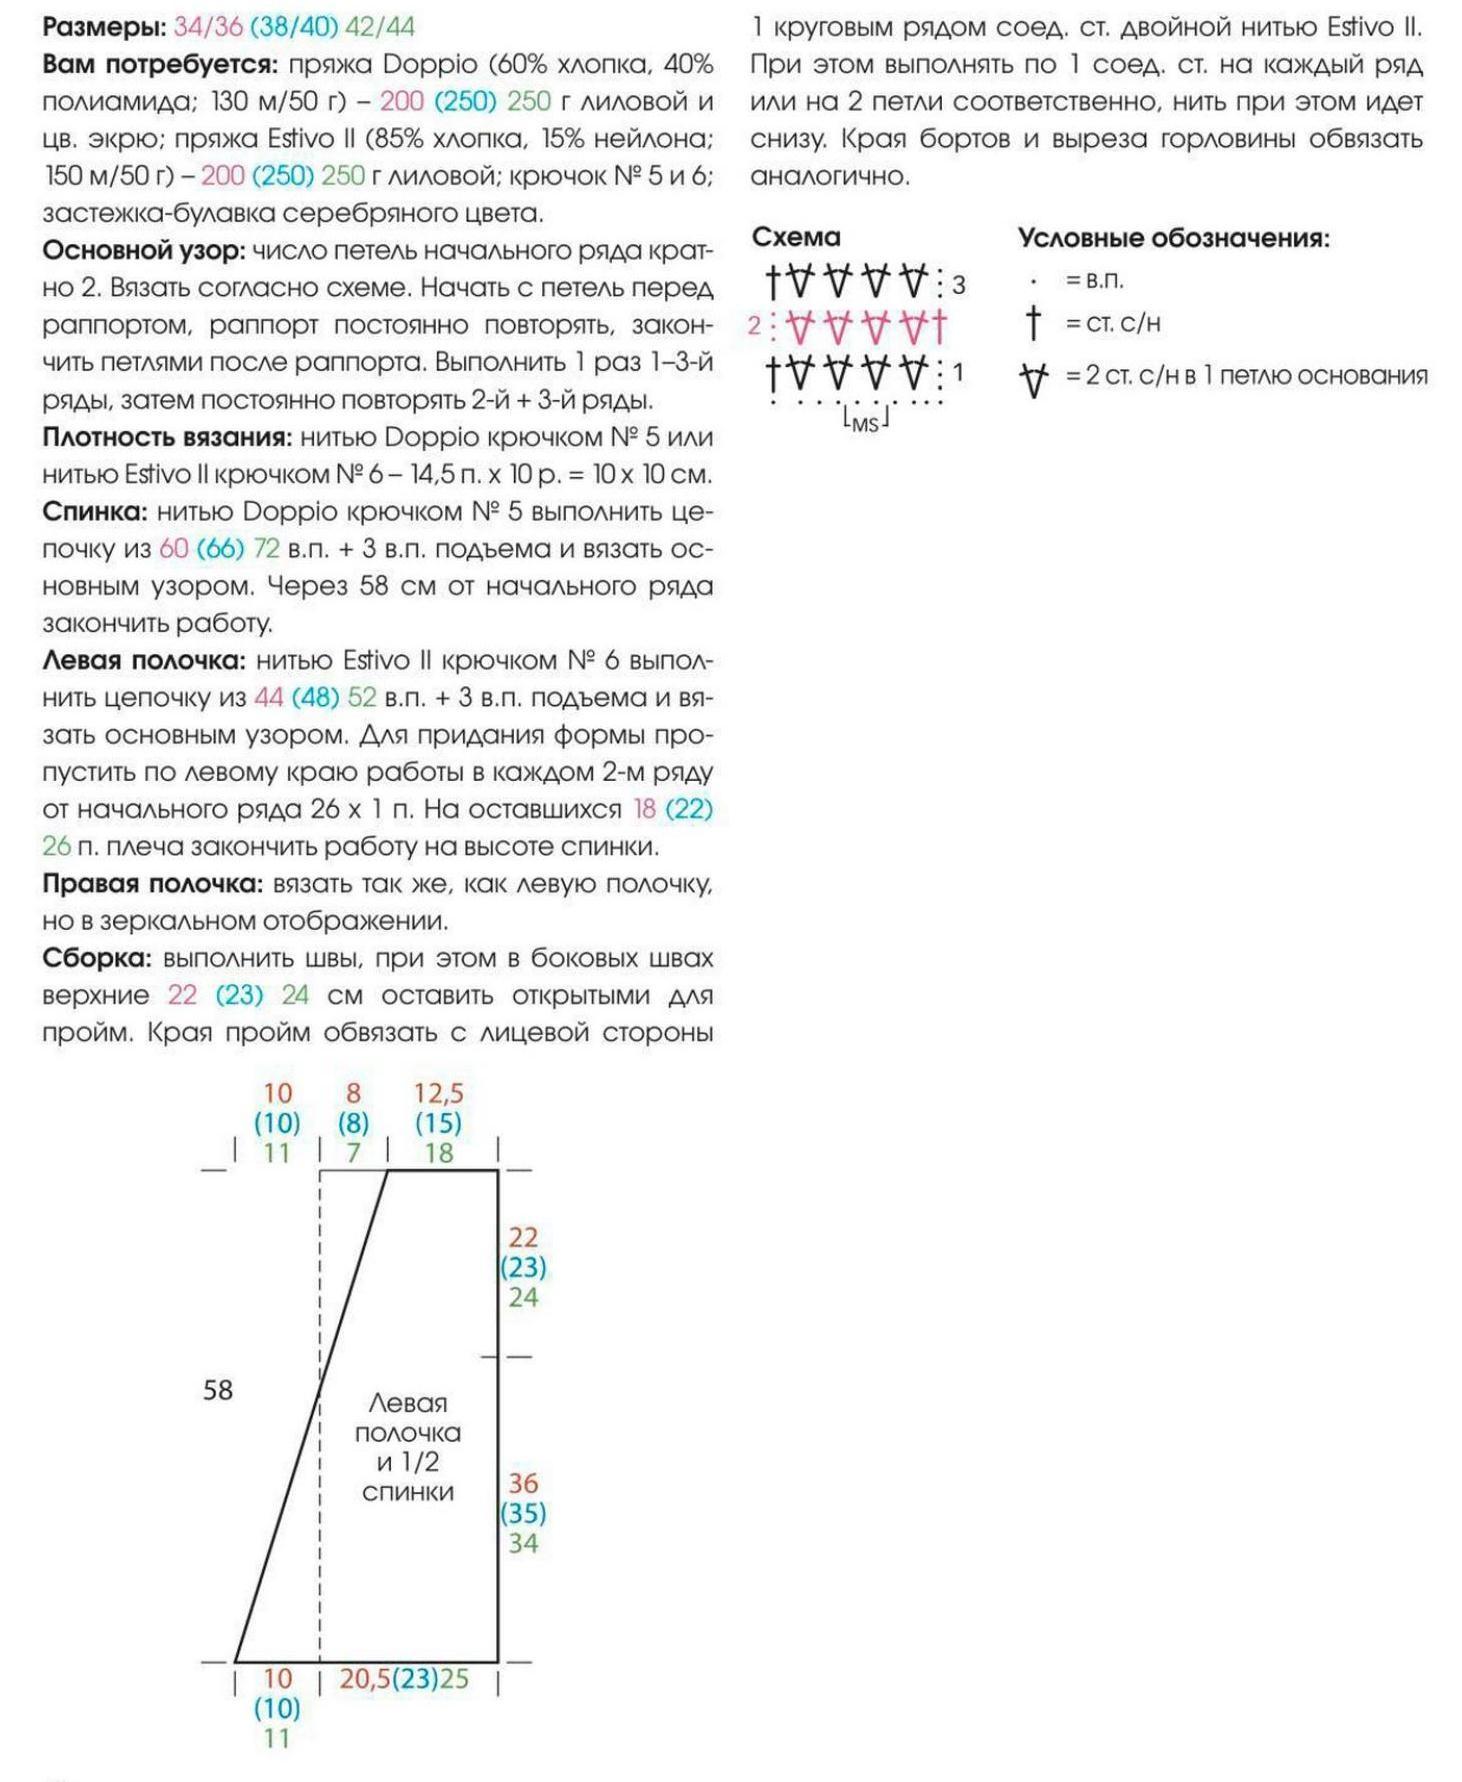 0887_MalD1ana022016_16 (3)